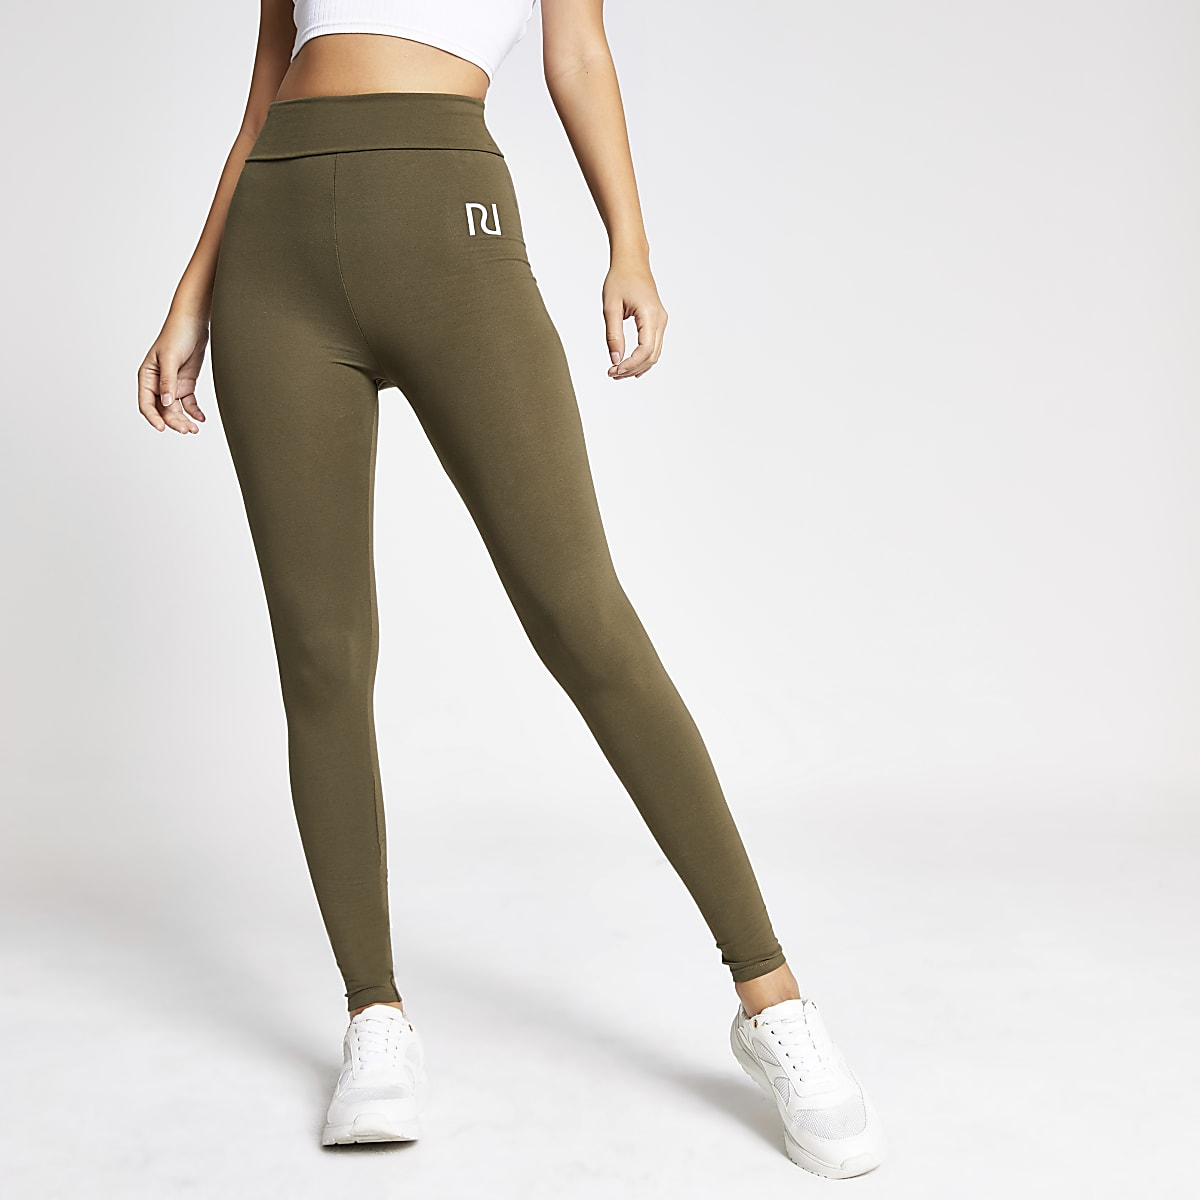 Khaki RI fold over leggings